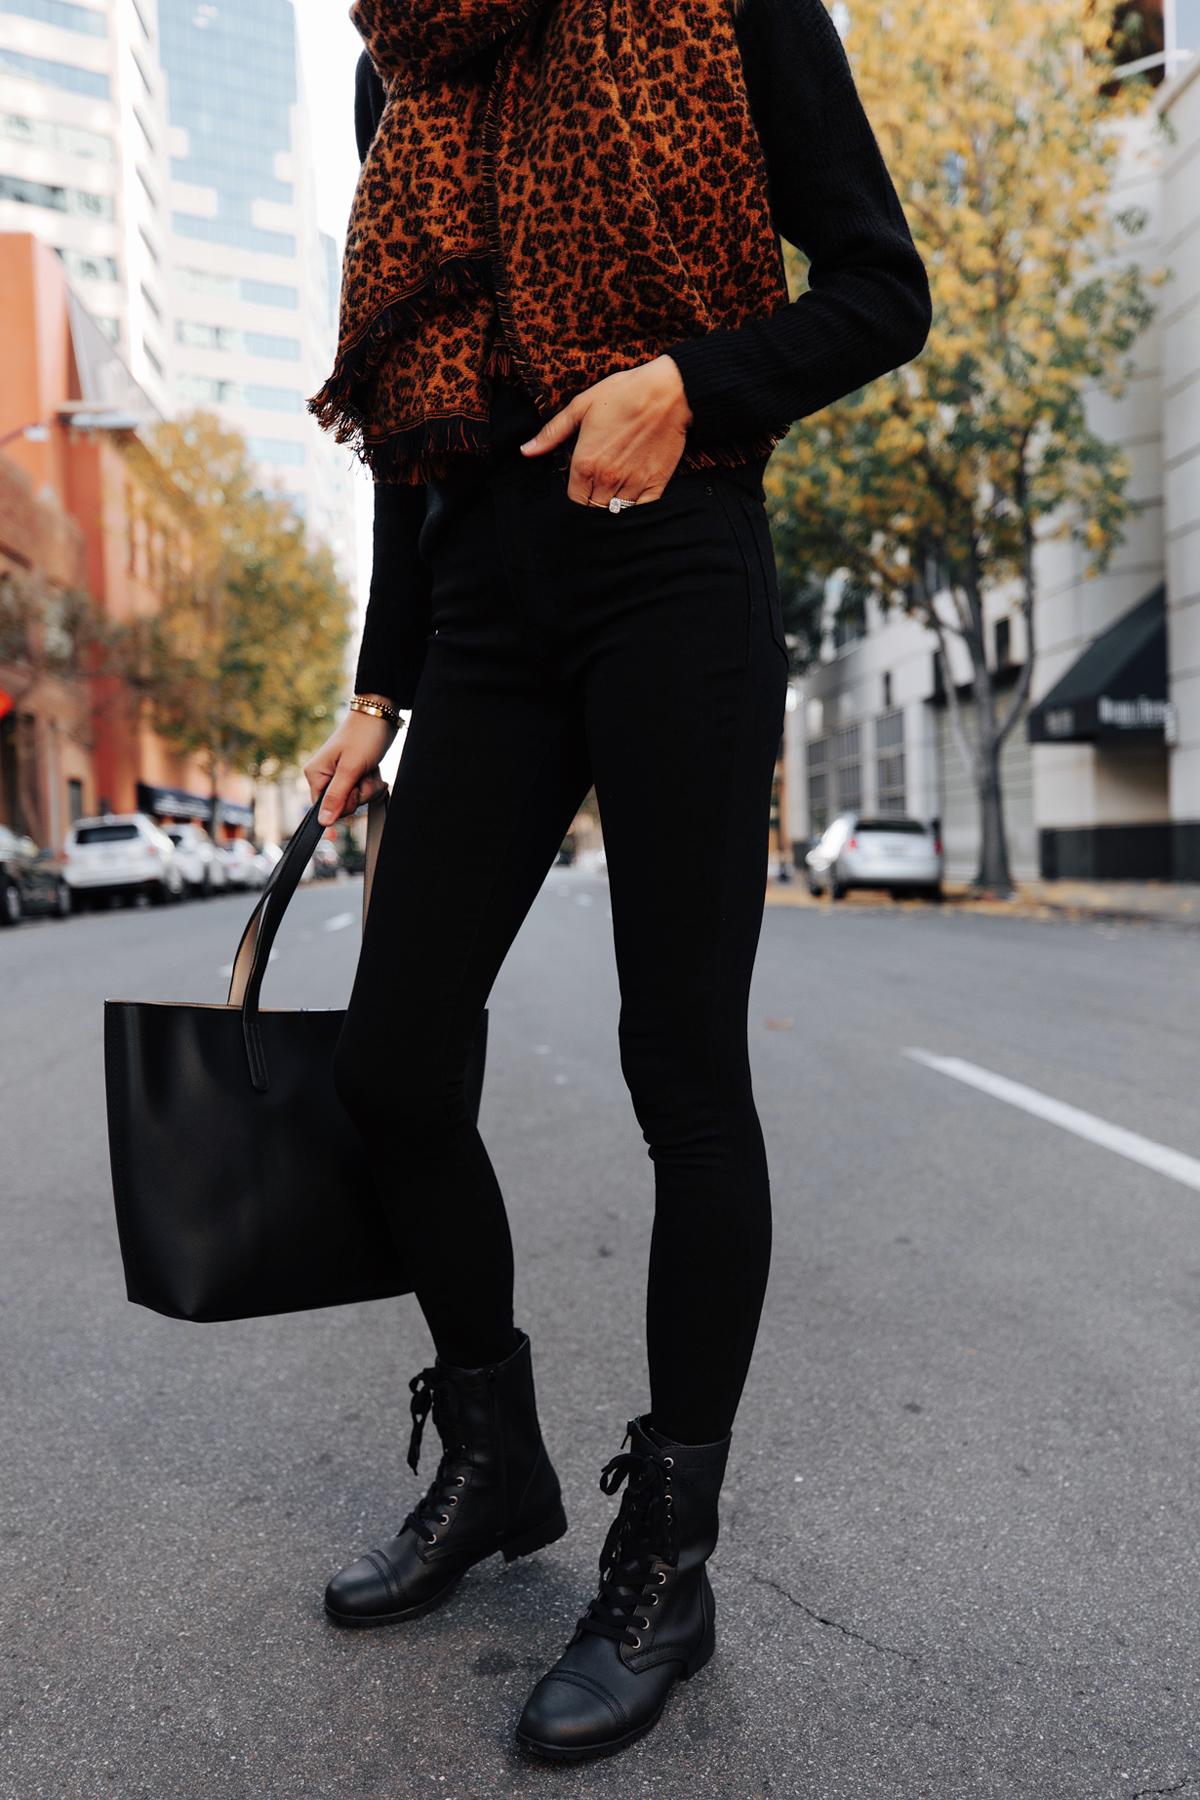 Fashion Jackson Wearing Walmart Combat Boots Black Skinny Jeans Black Sweater Leopard Blanket Scarf Winter Accessories